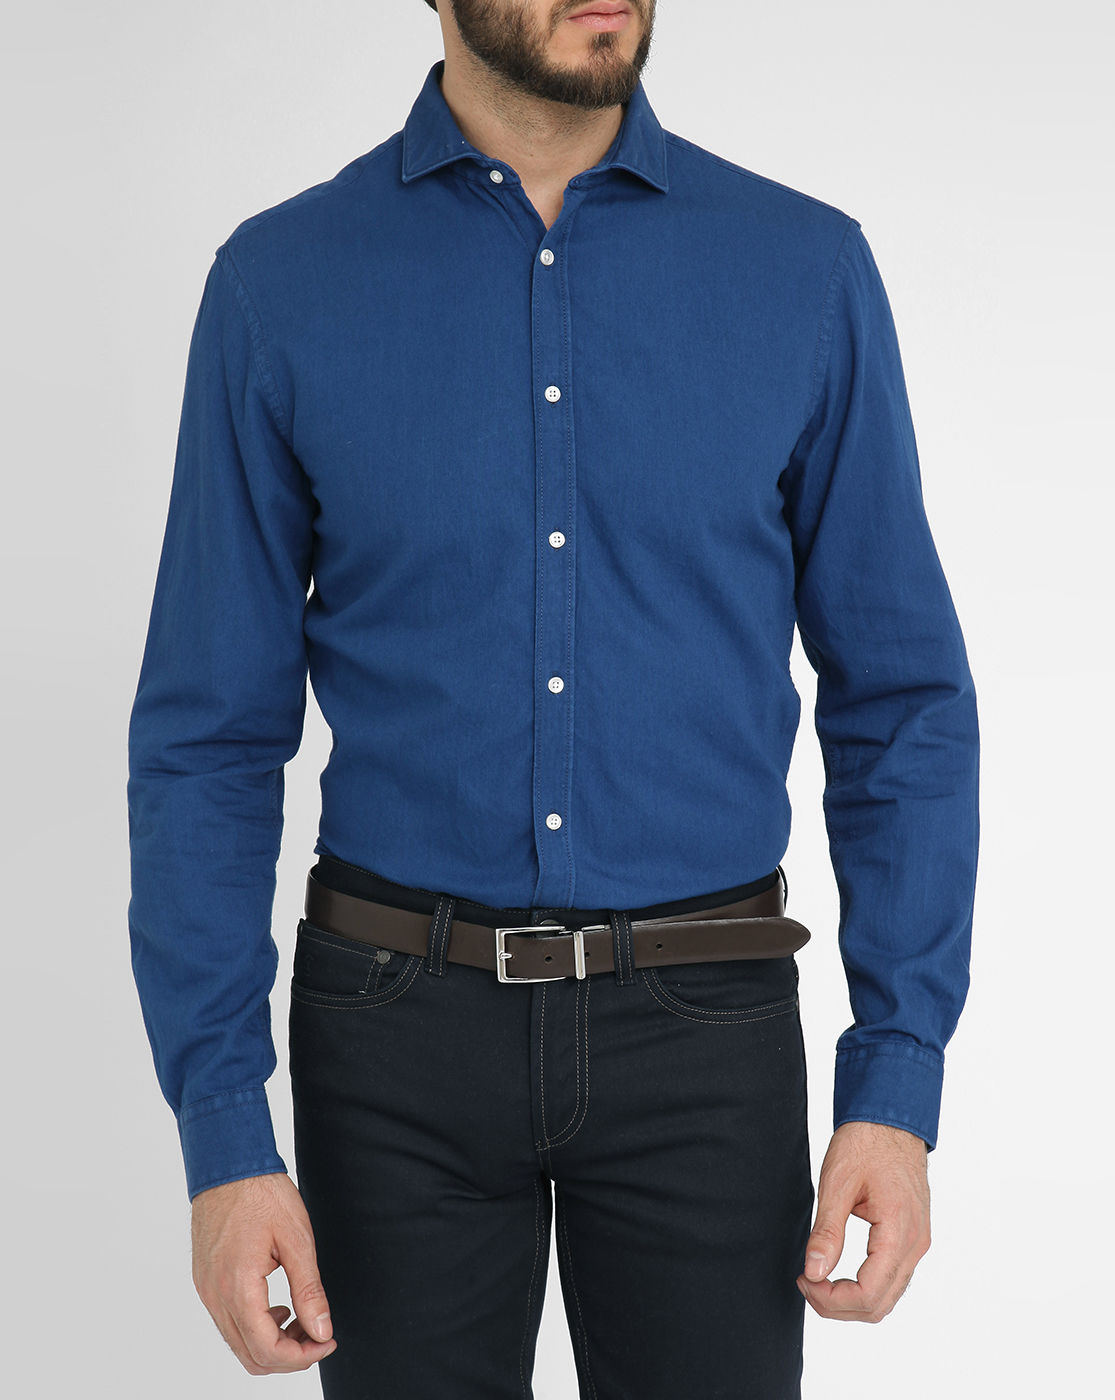 Celio club navy denim slim fit shirt in blue for men lyst for Navy slim fit shirt